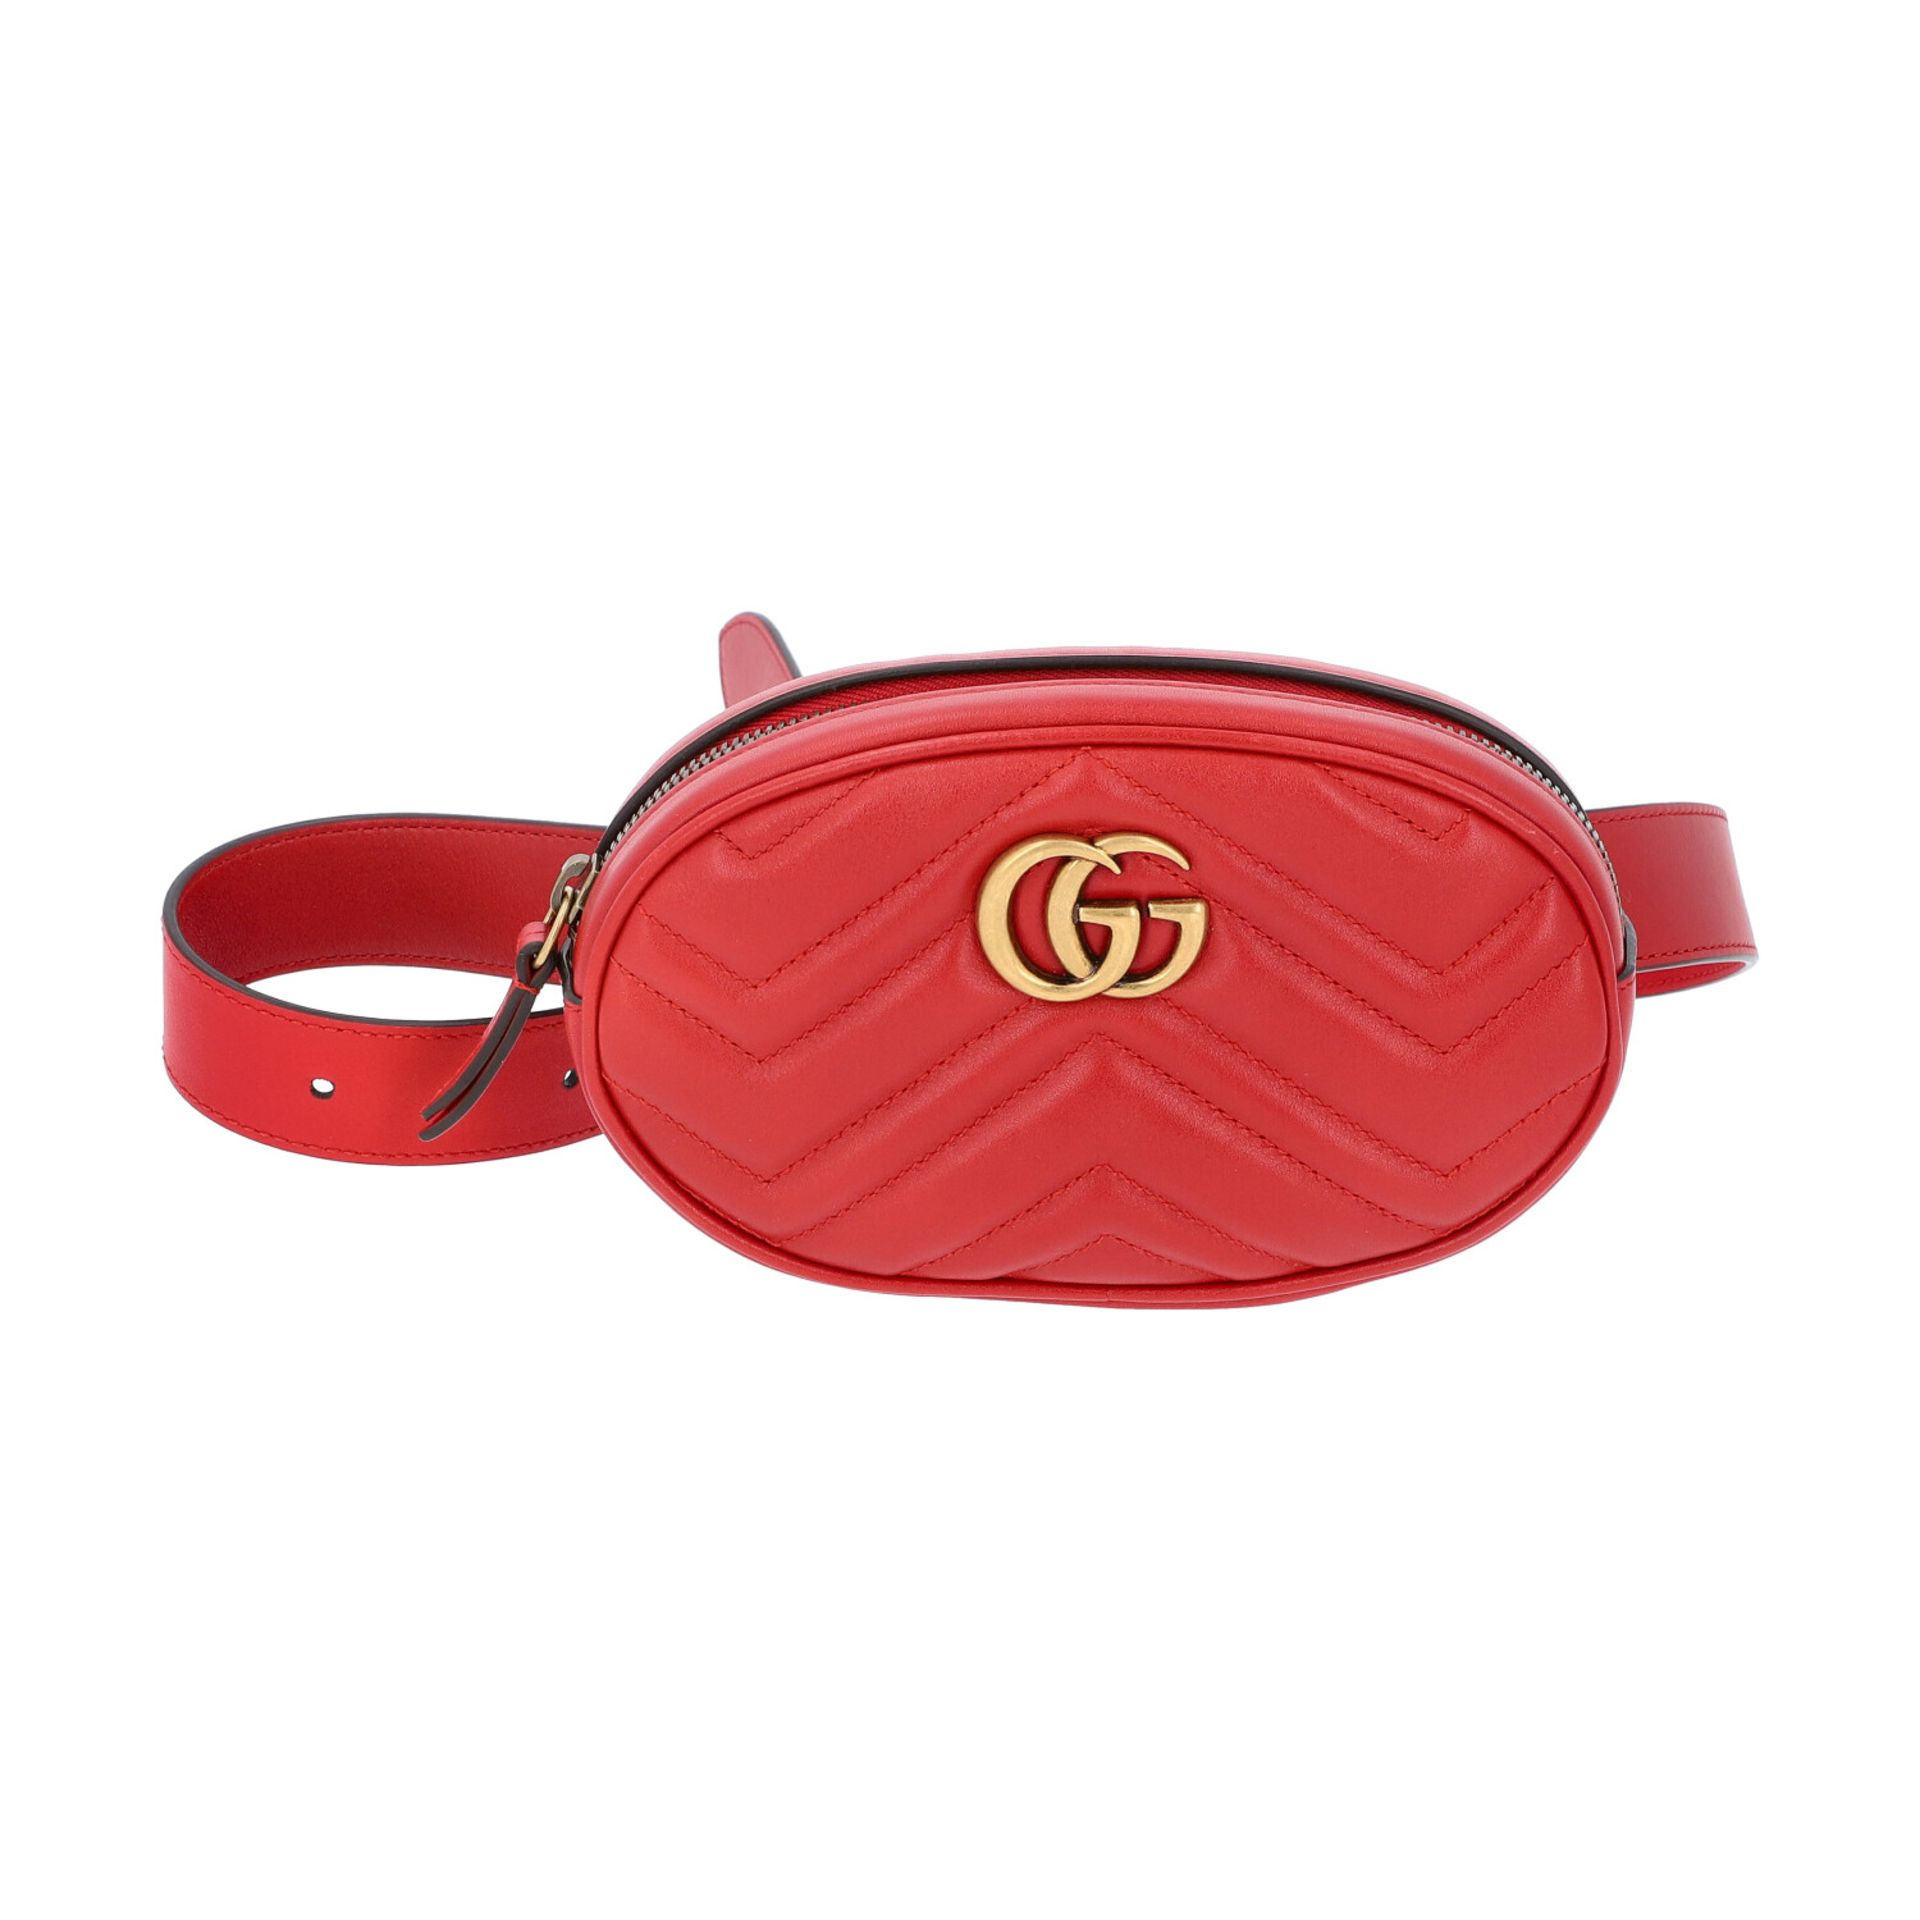 "GUCCI Gürteltasche ""GG MARMONT"". Gürtellänge 75cm.Akt. NP.: 950,-€. Matelassé-Leder in Rot mit"